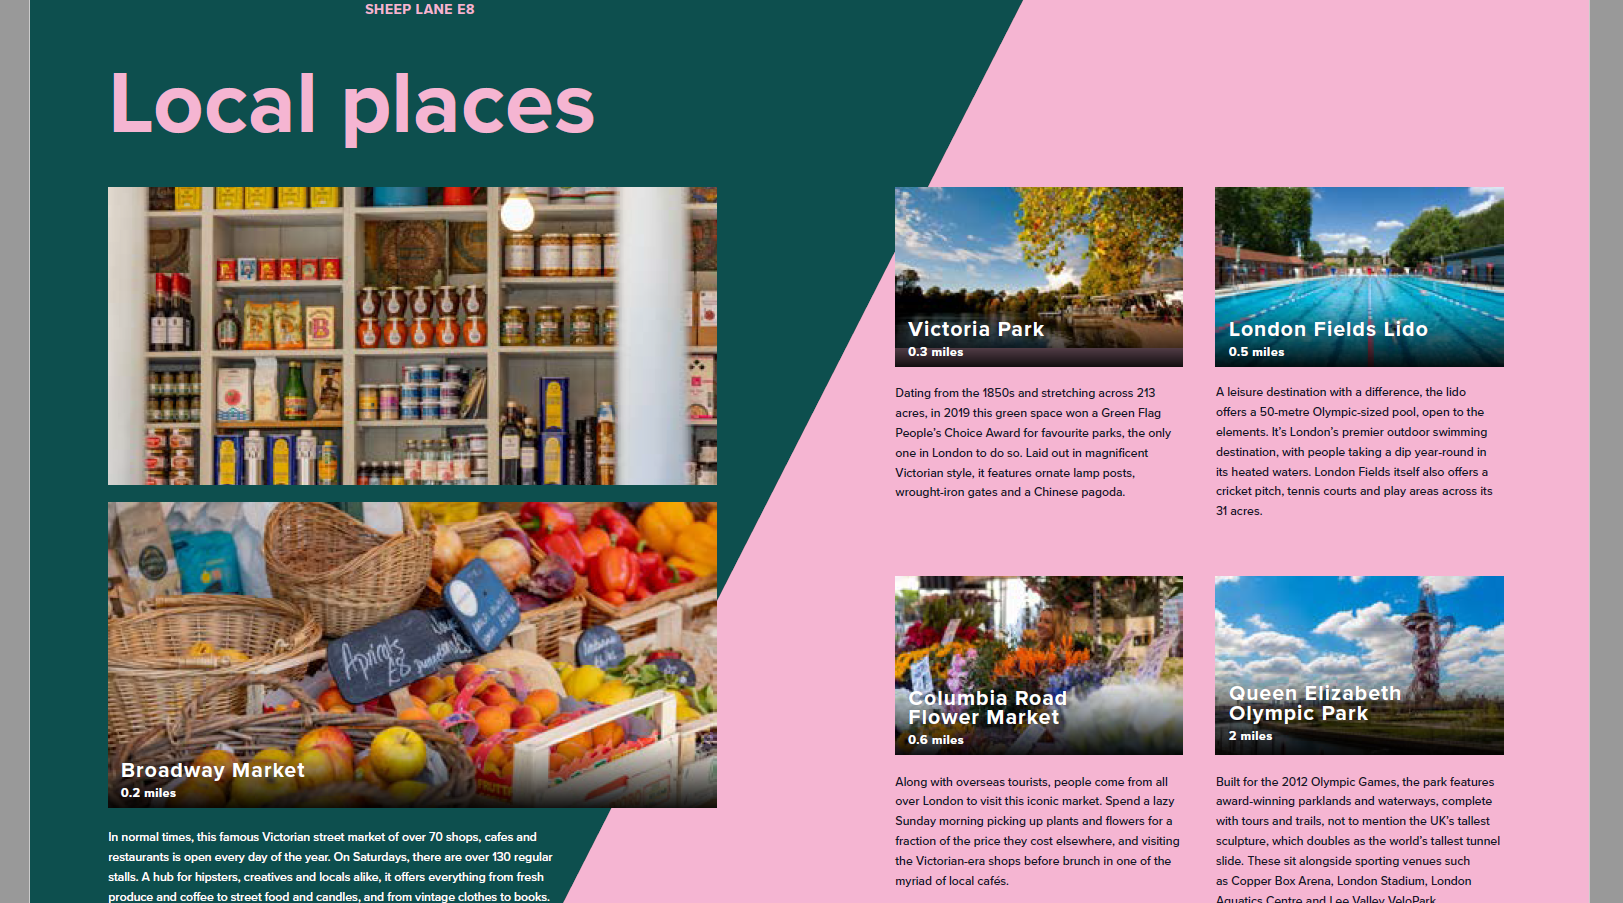 Hackney Sheep Lane - shared living brochure